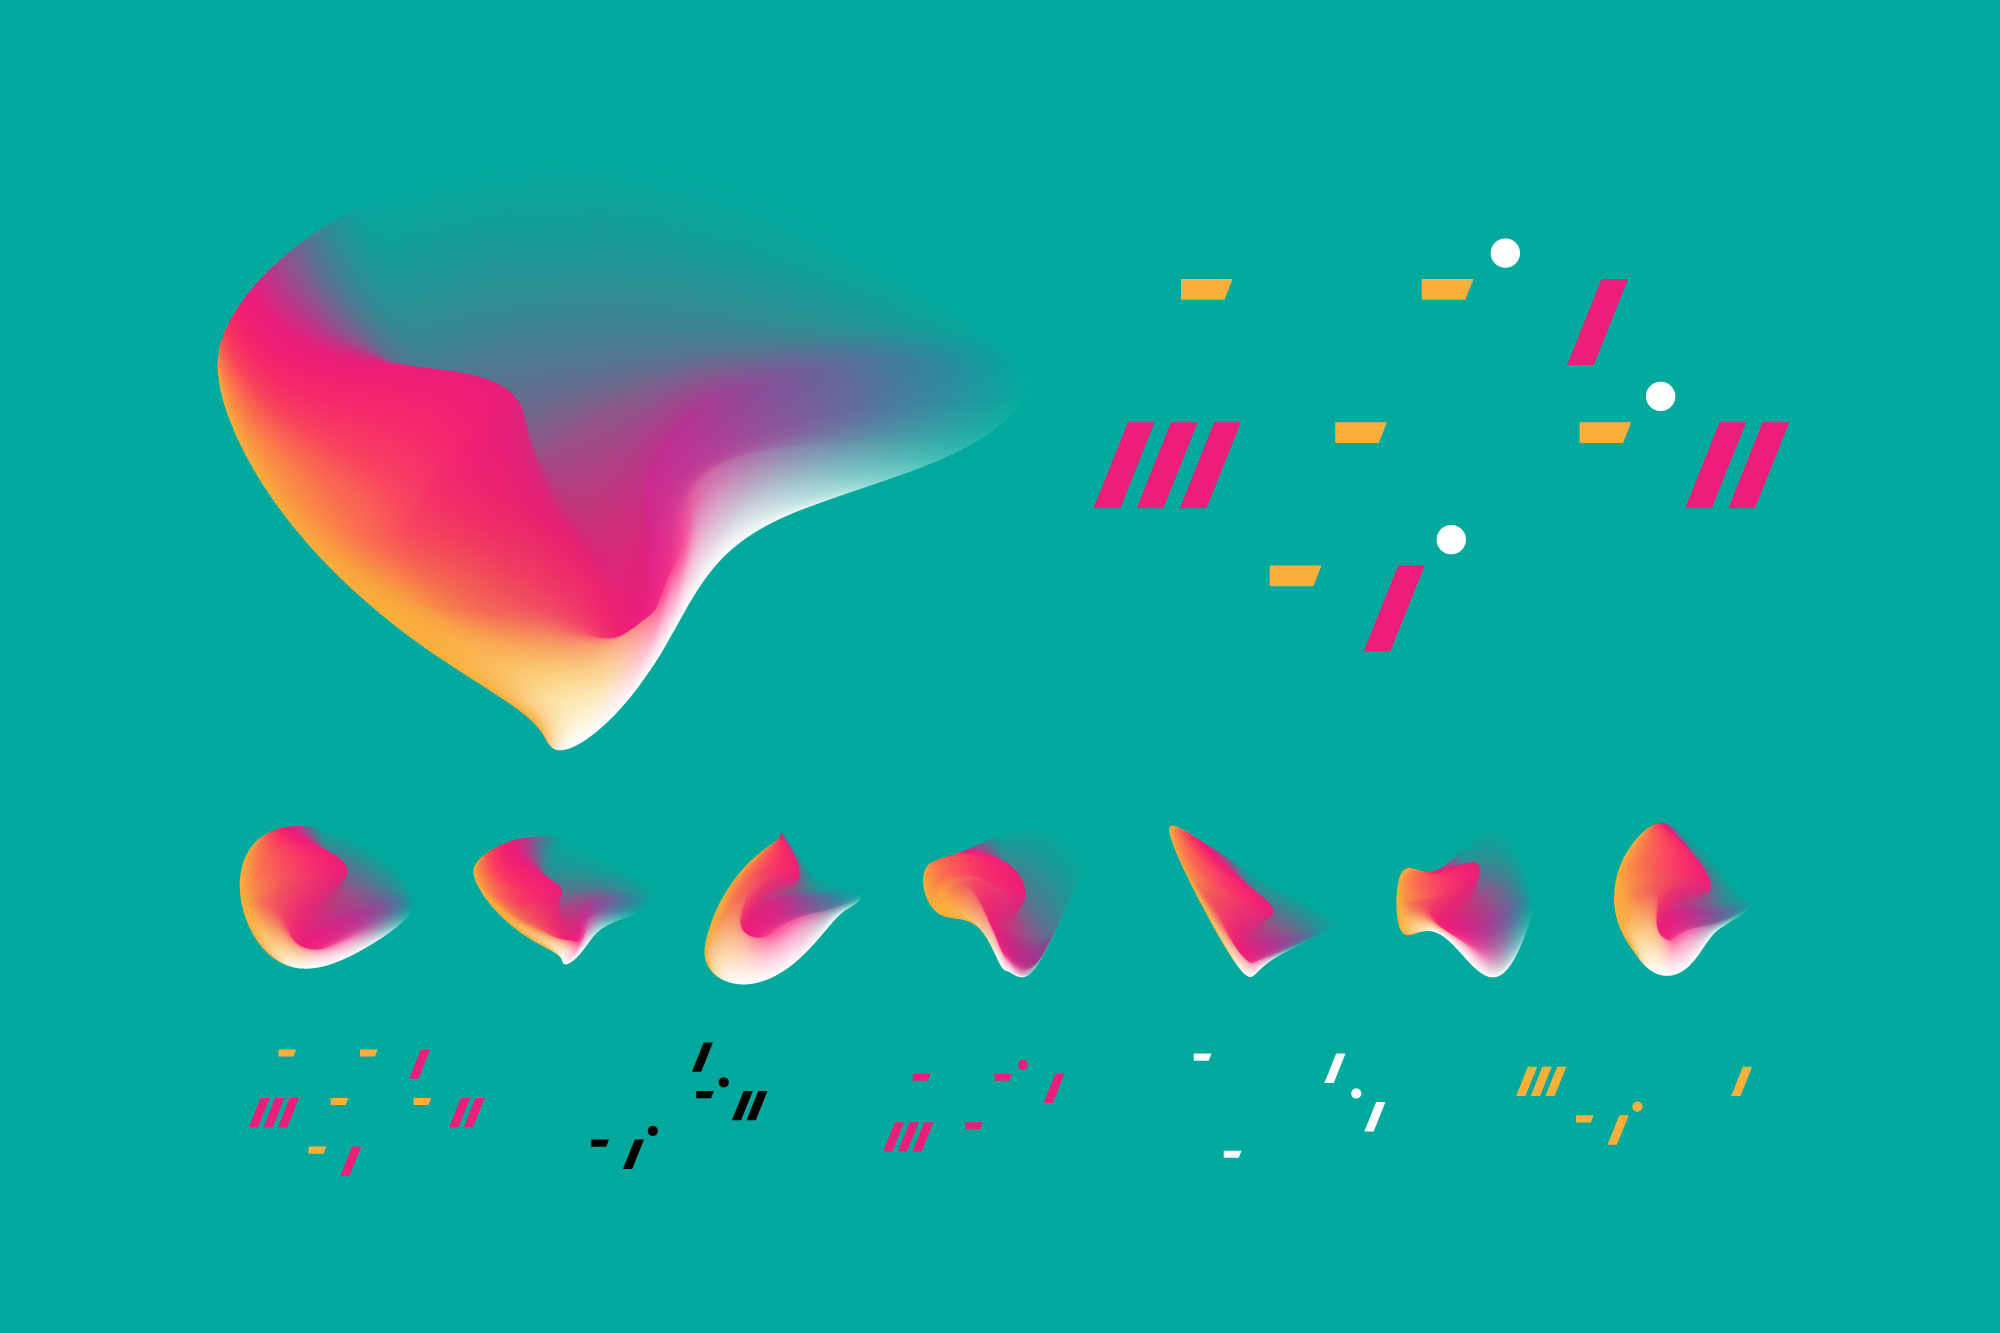 cms-graphic-04-by-yastudio